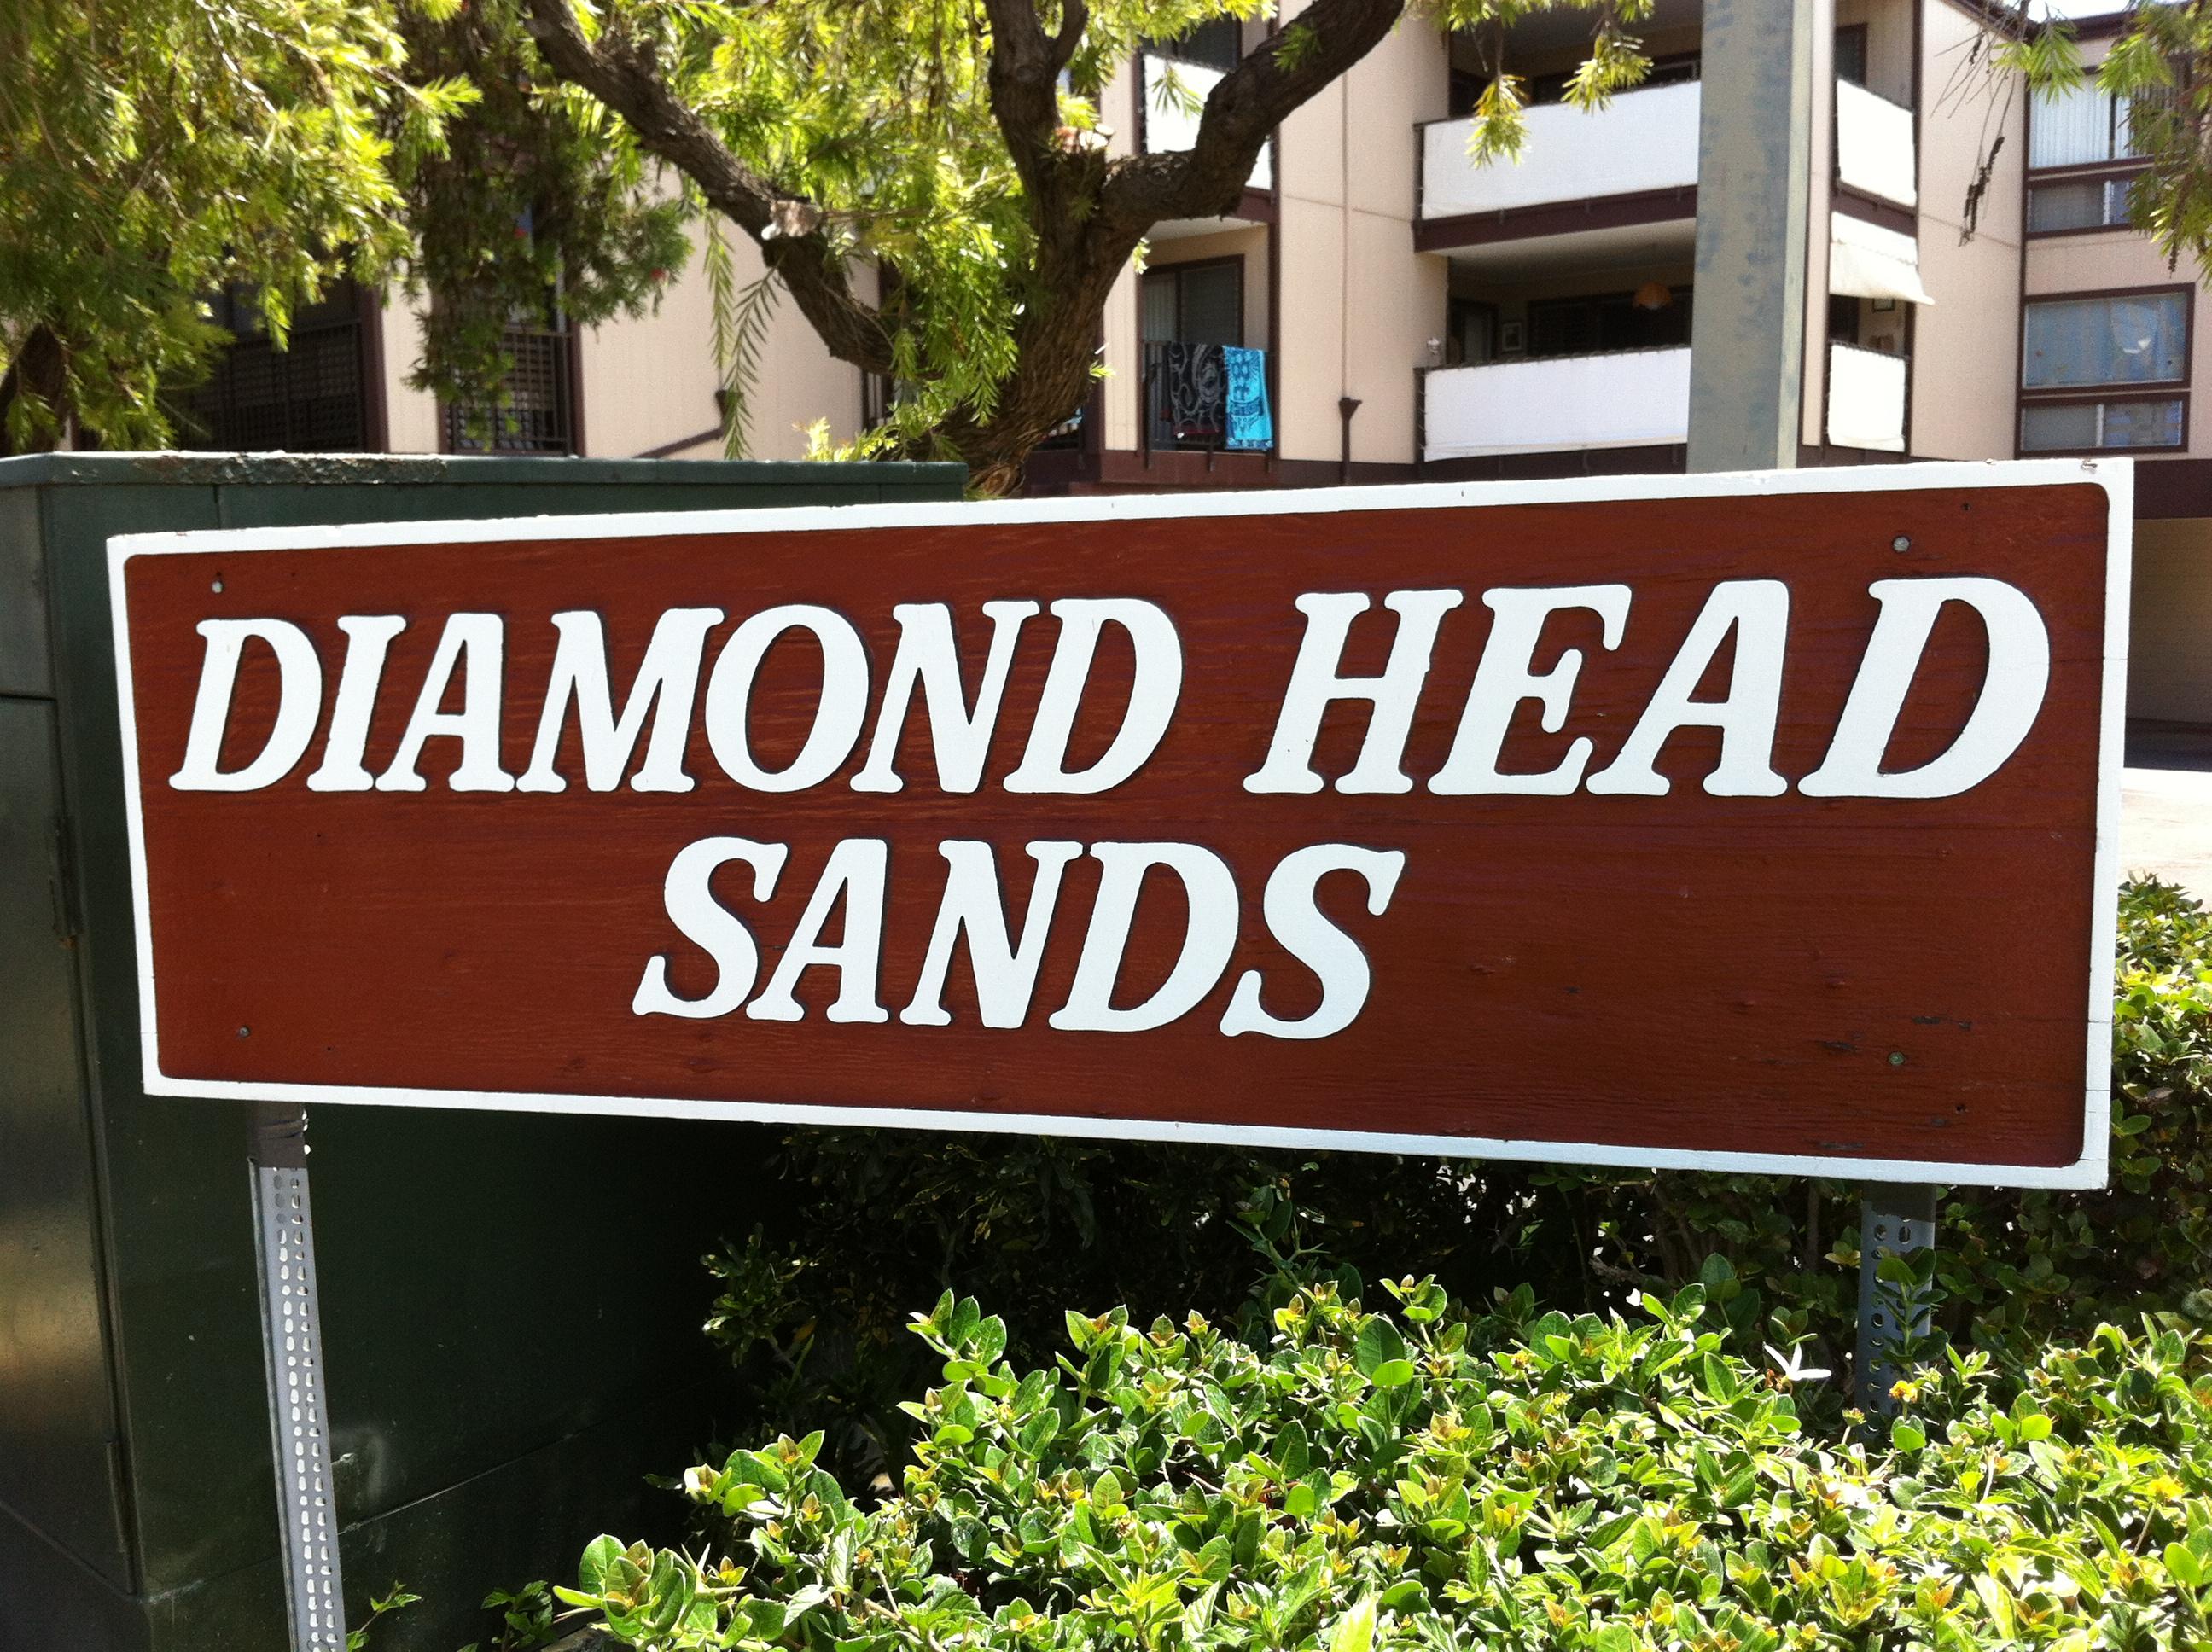 Diamond Head Sands sign